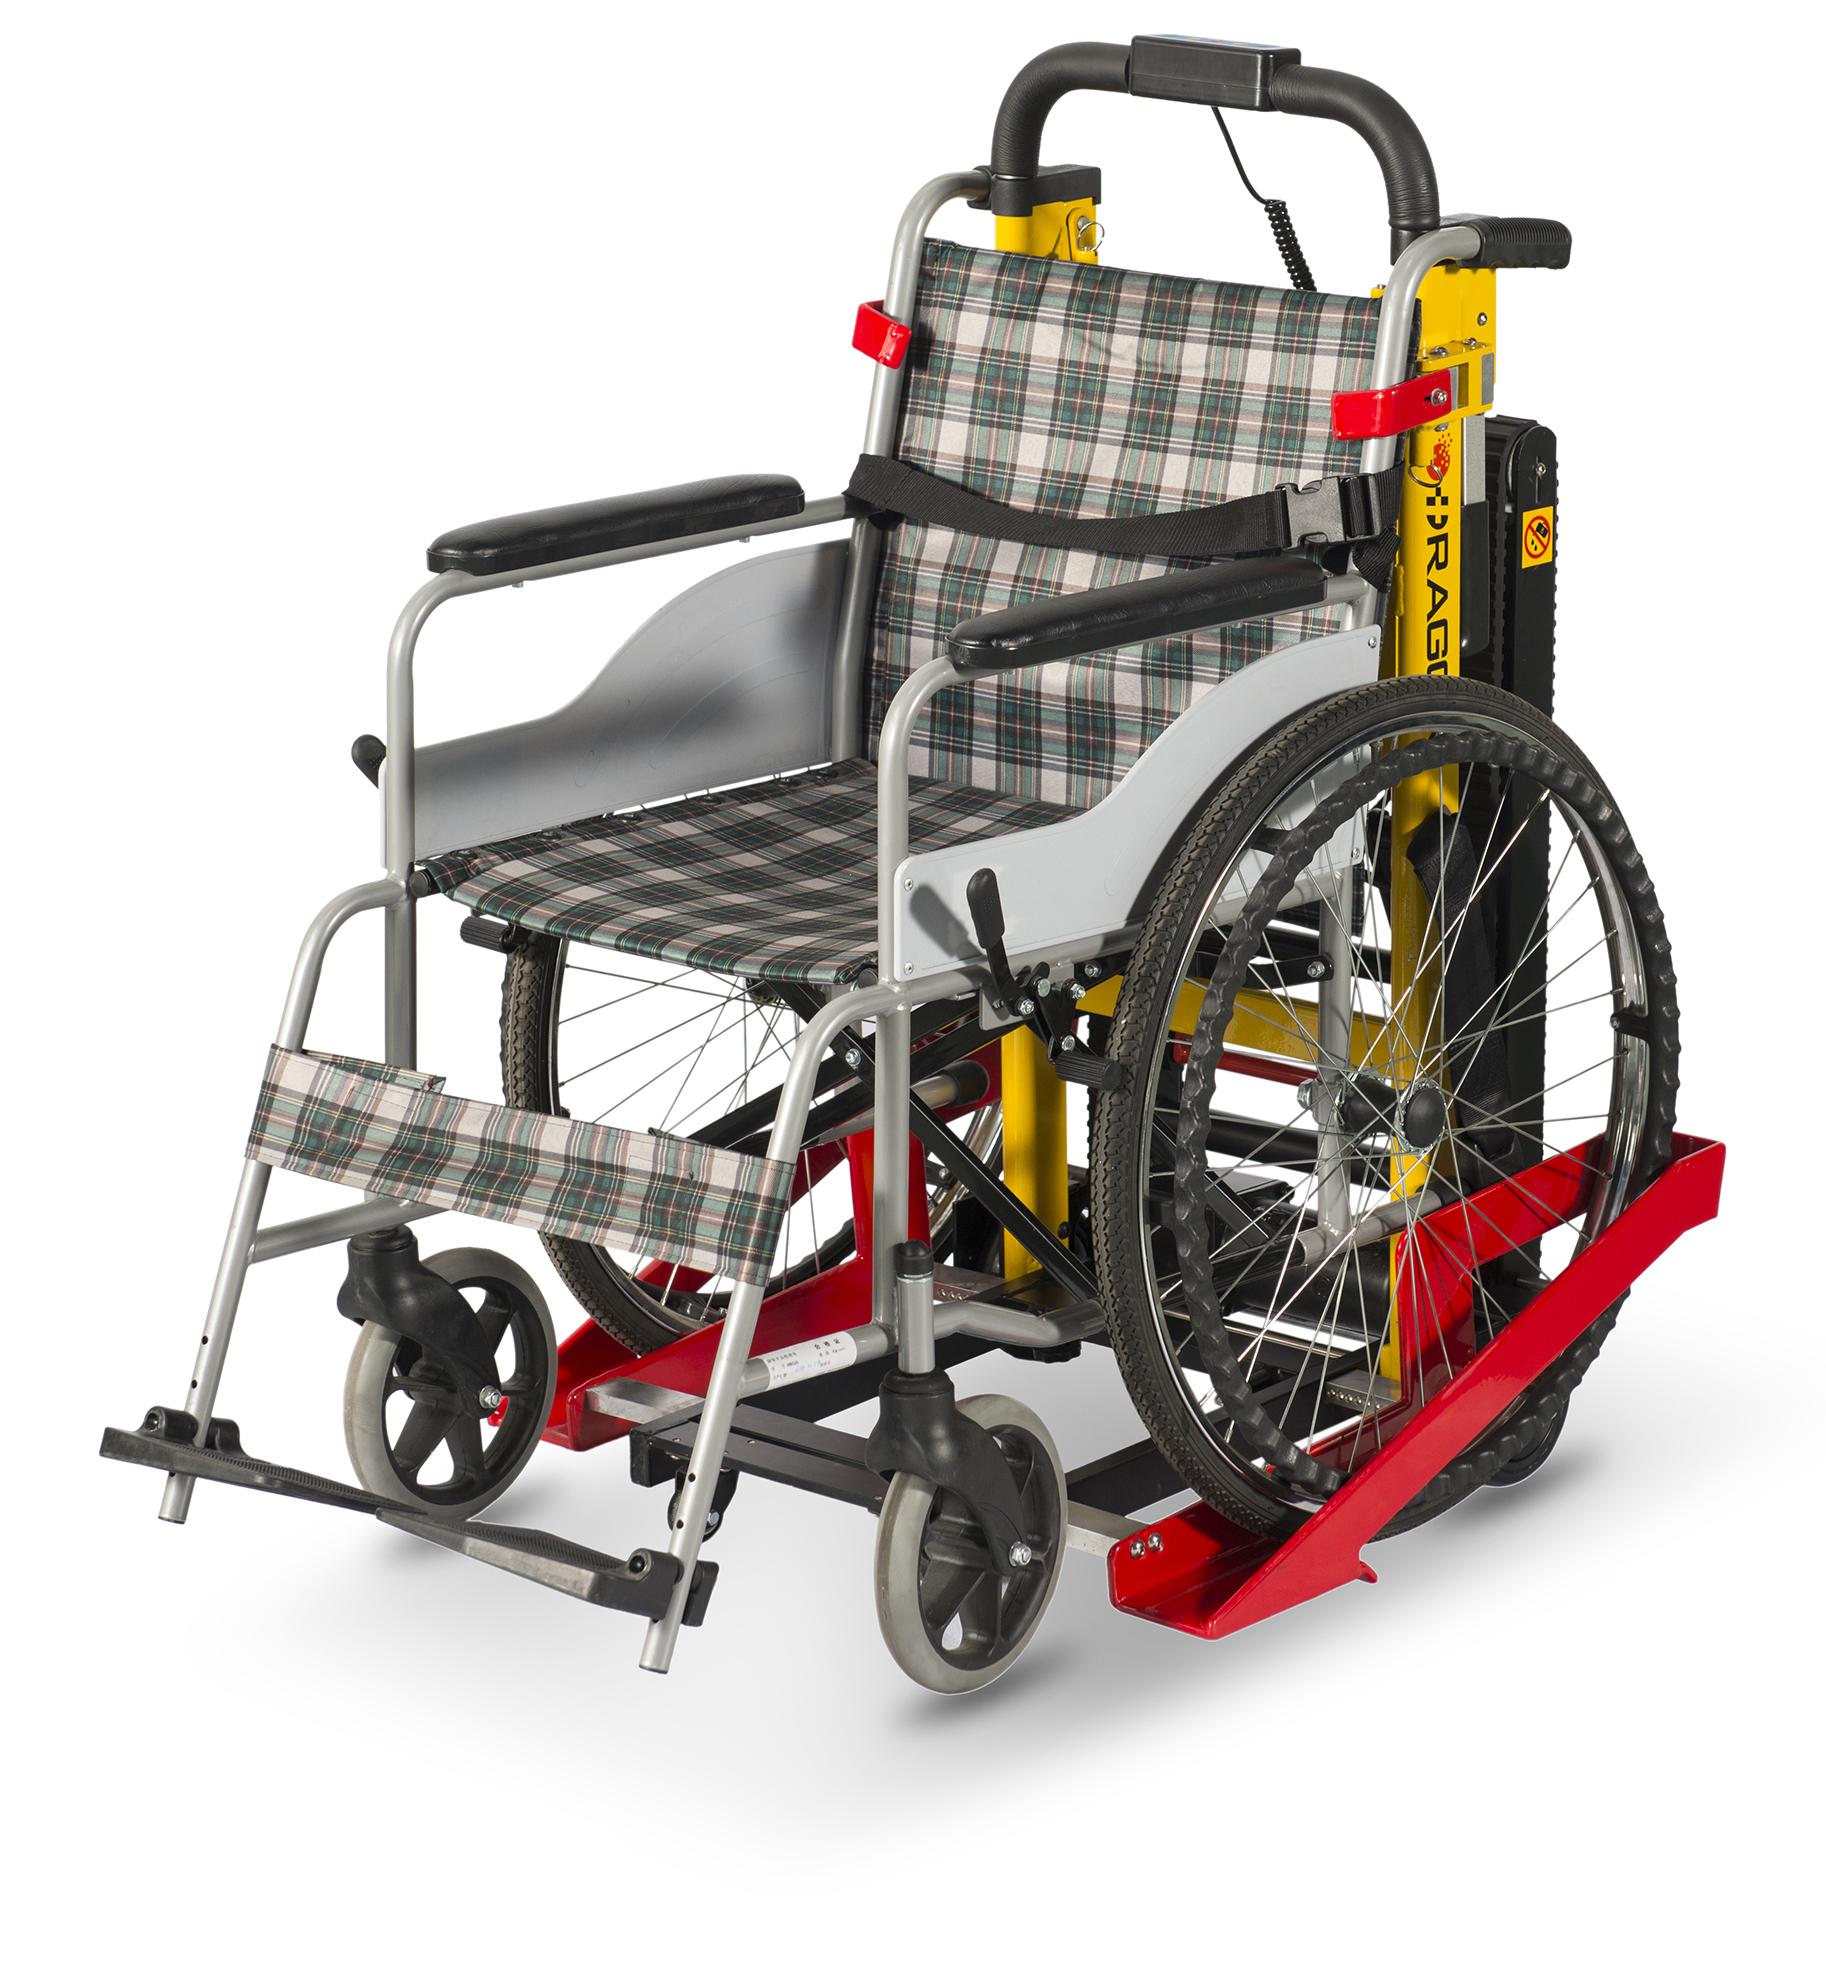 DW-11C Electric Stair Climbing Handcart For Wheelchair